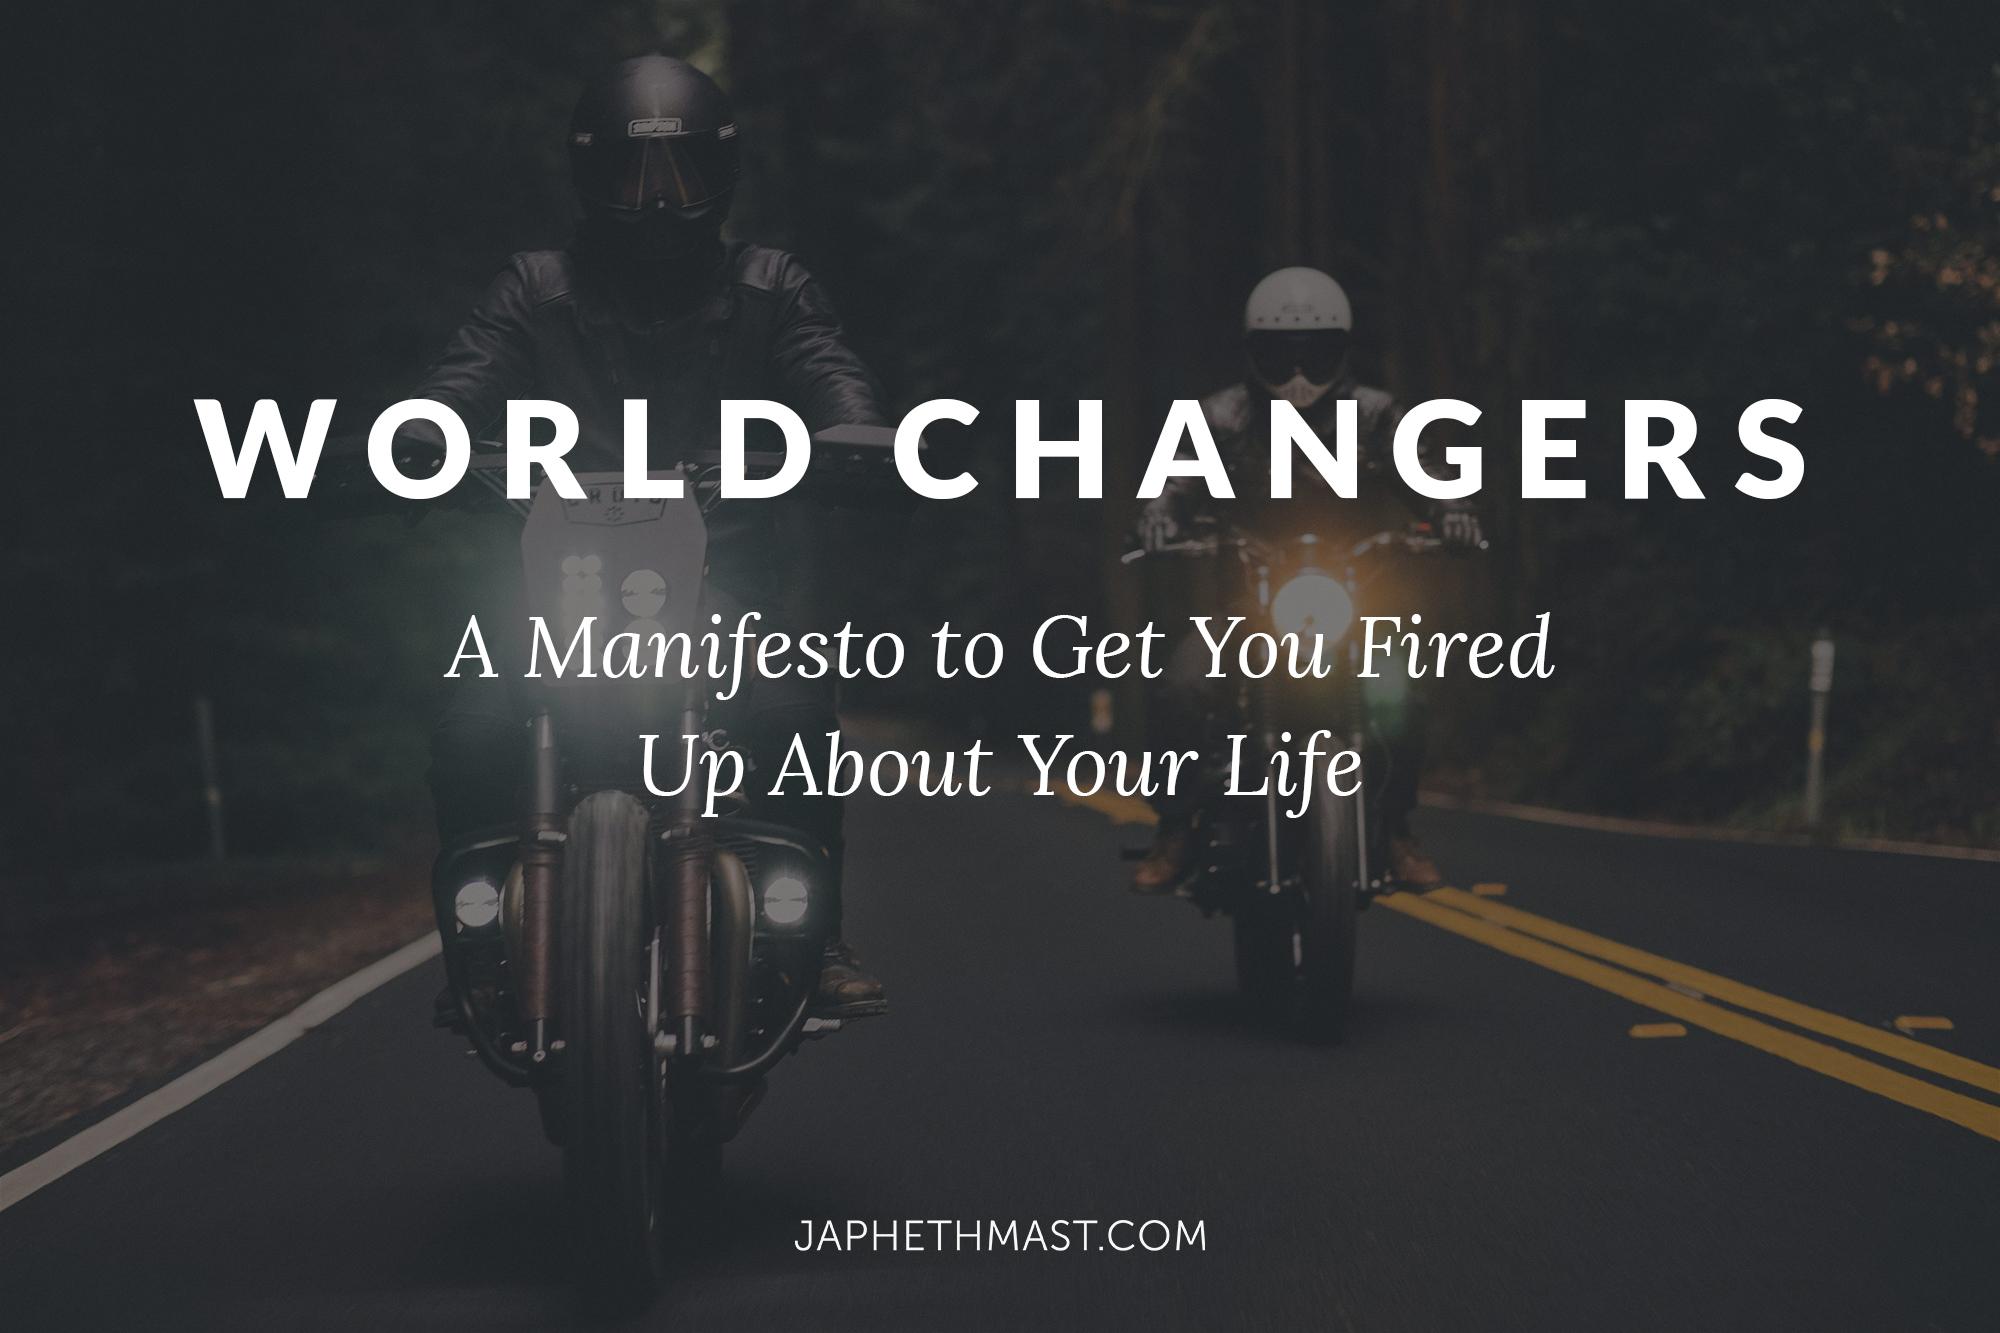 World Changers Manifesto | Japheth Mast Blog